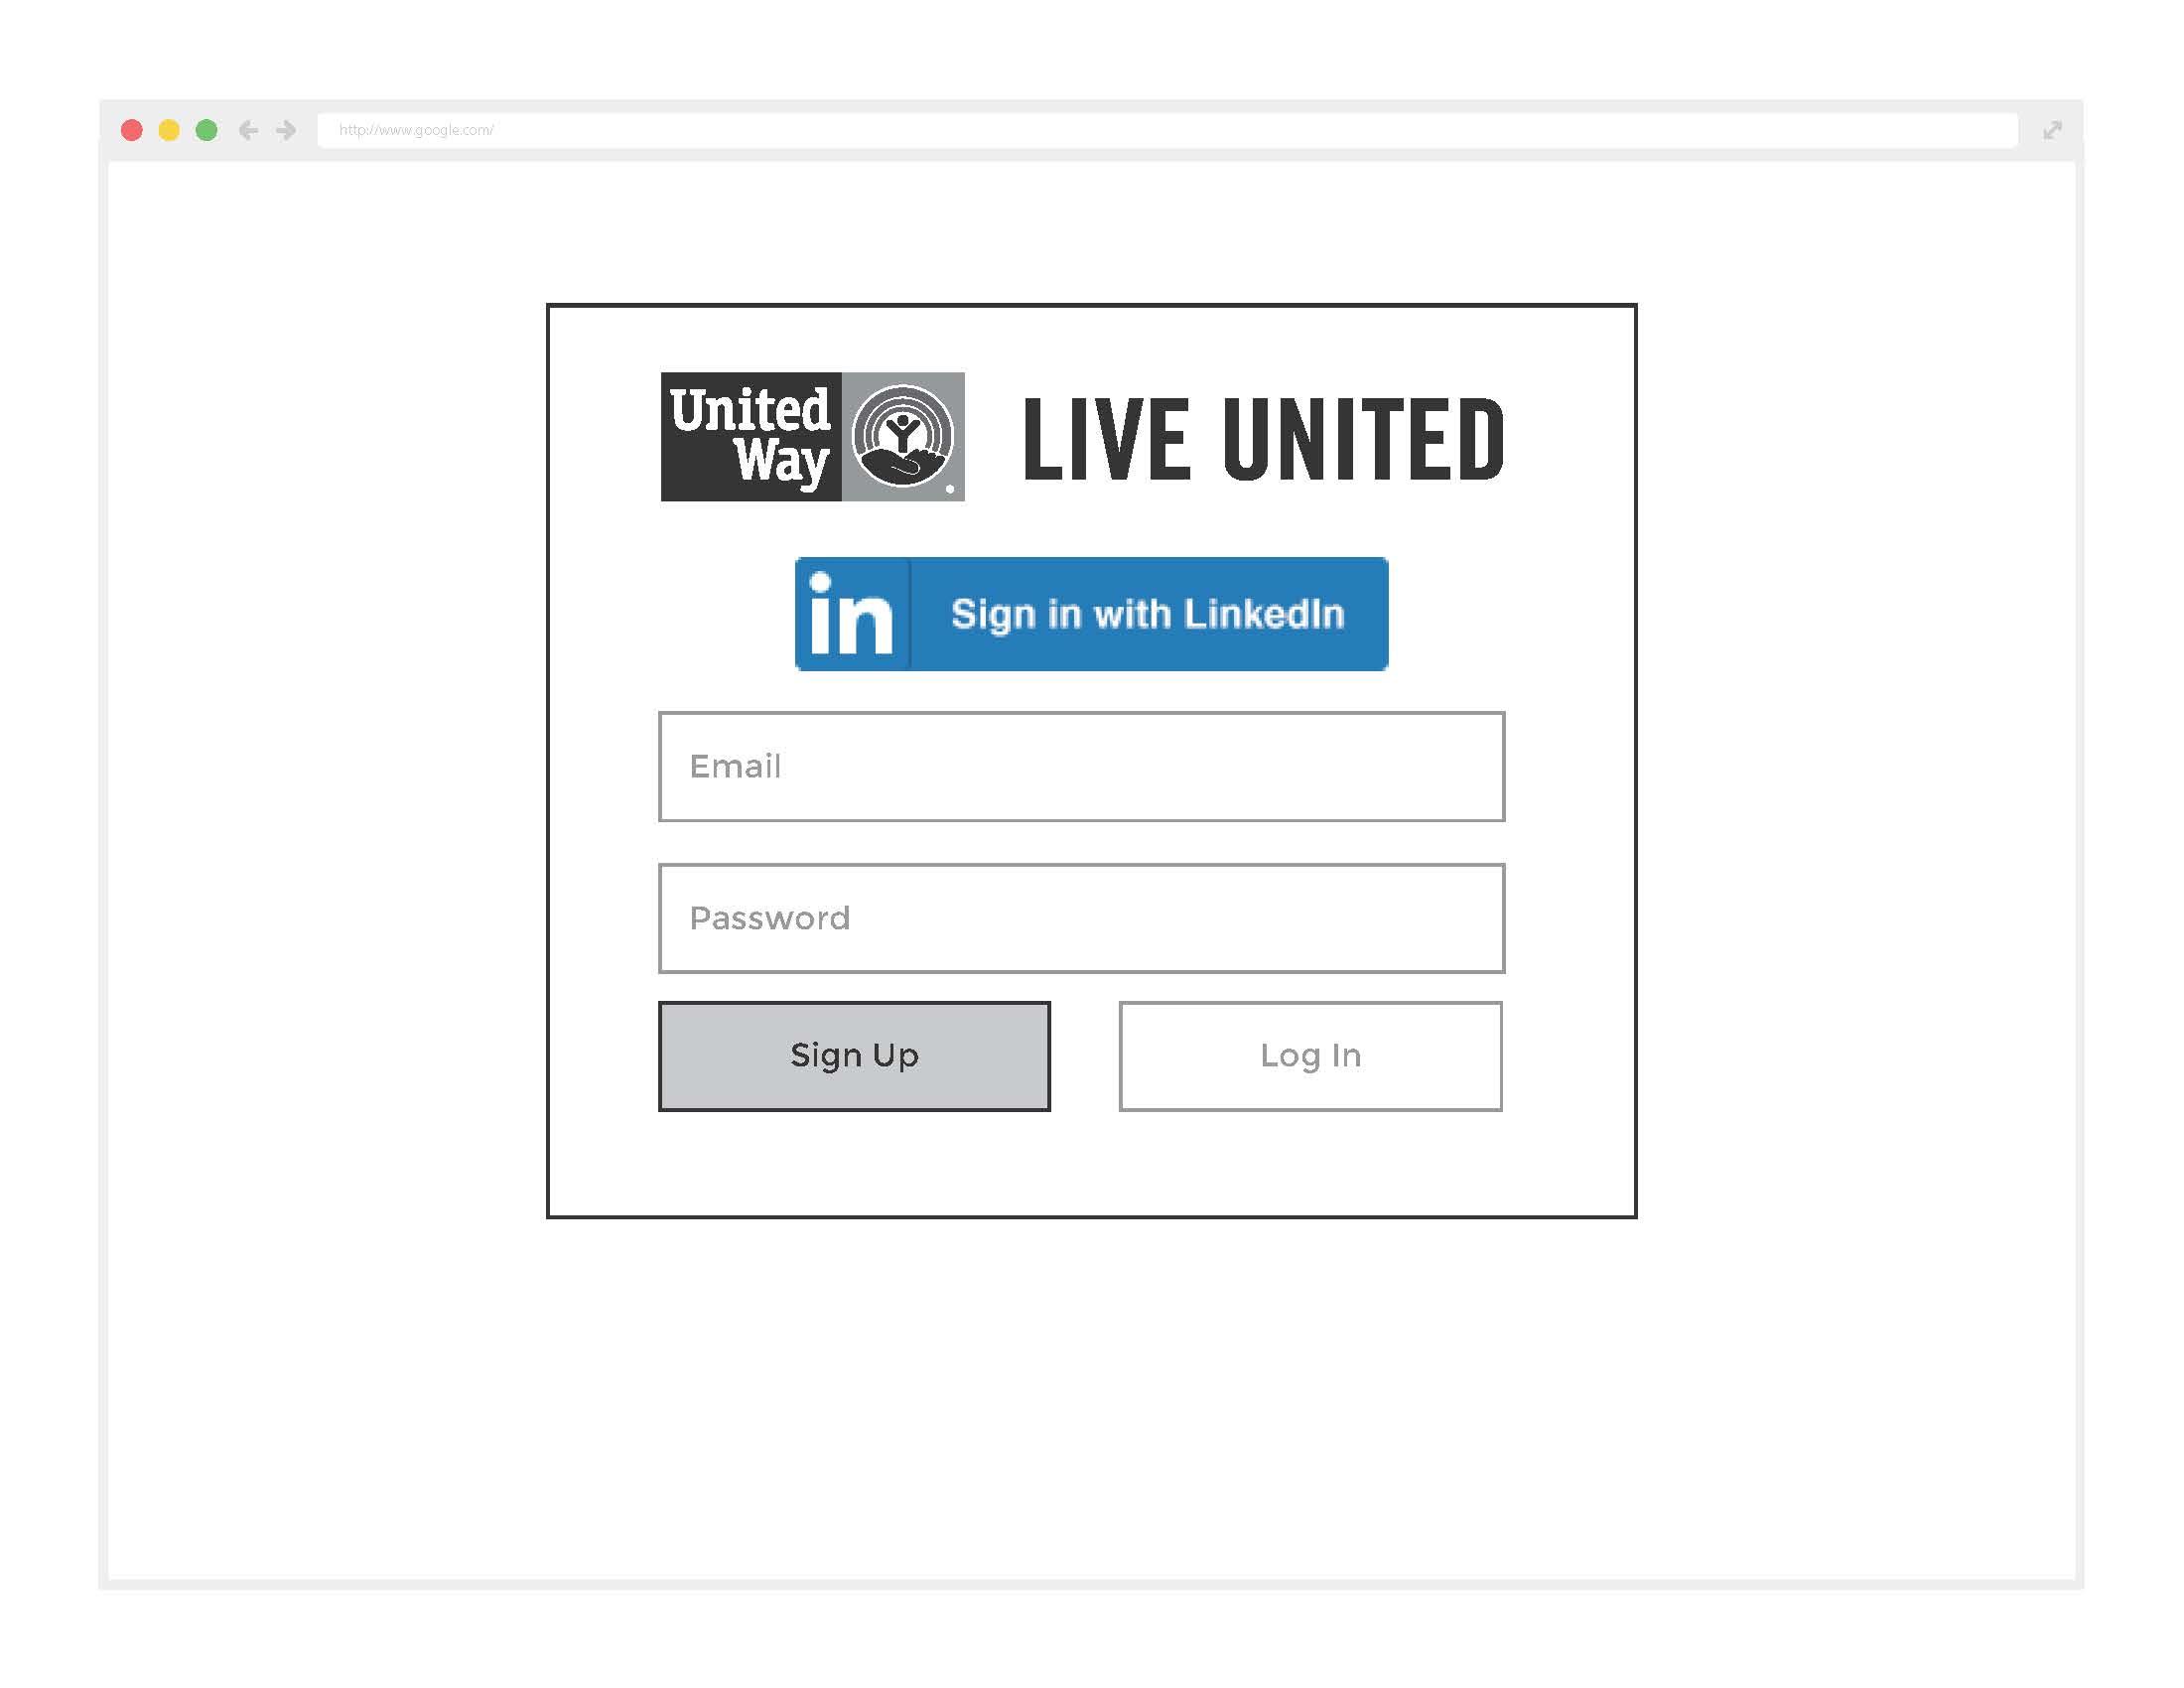 unitedway_Page_1.jpg